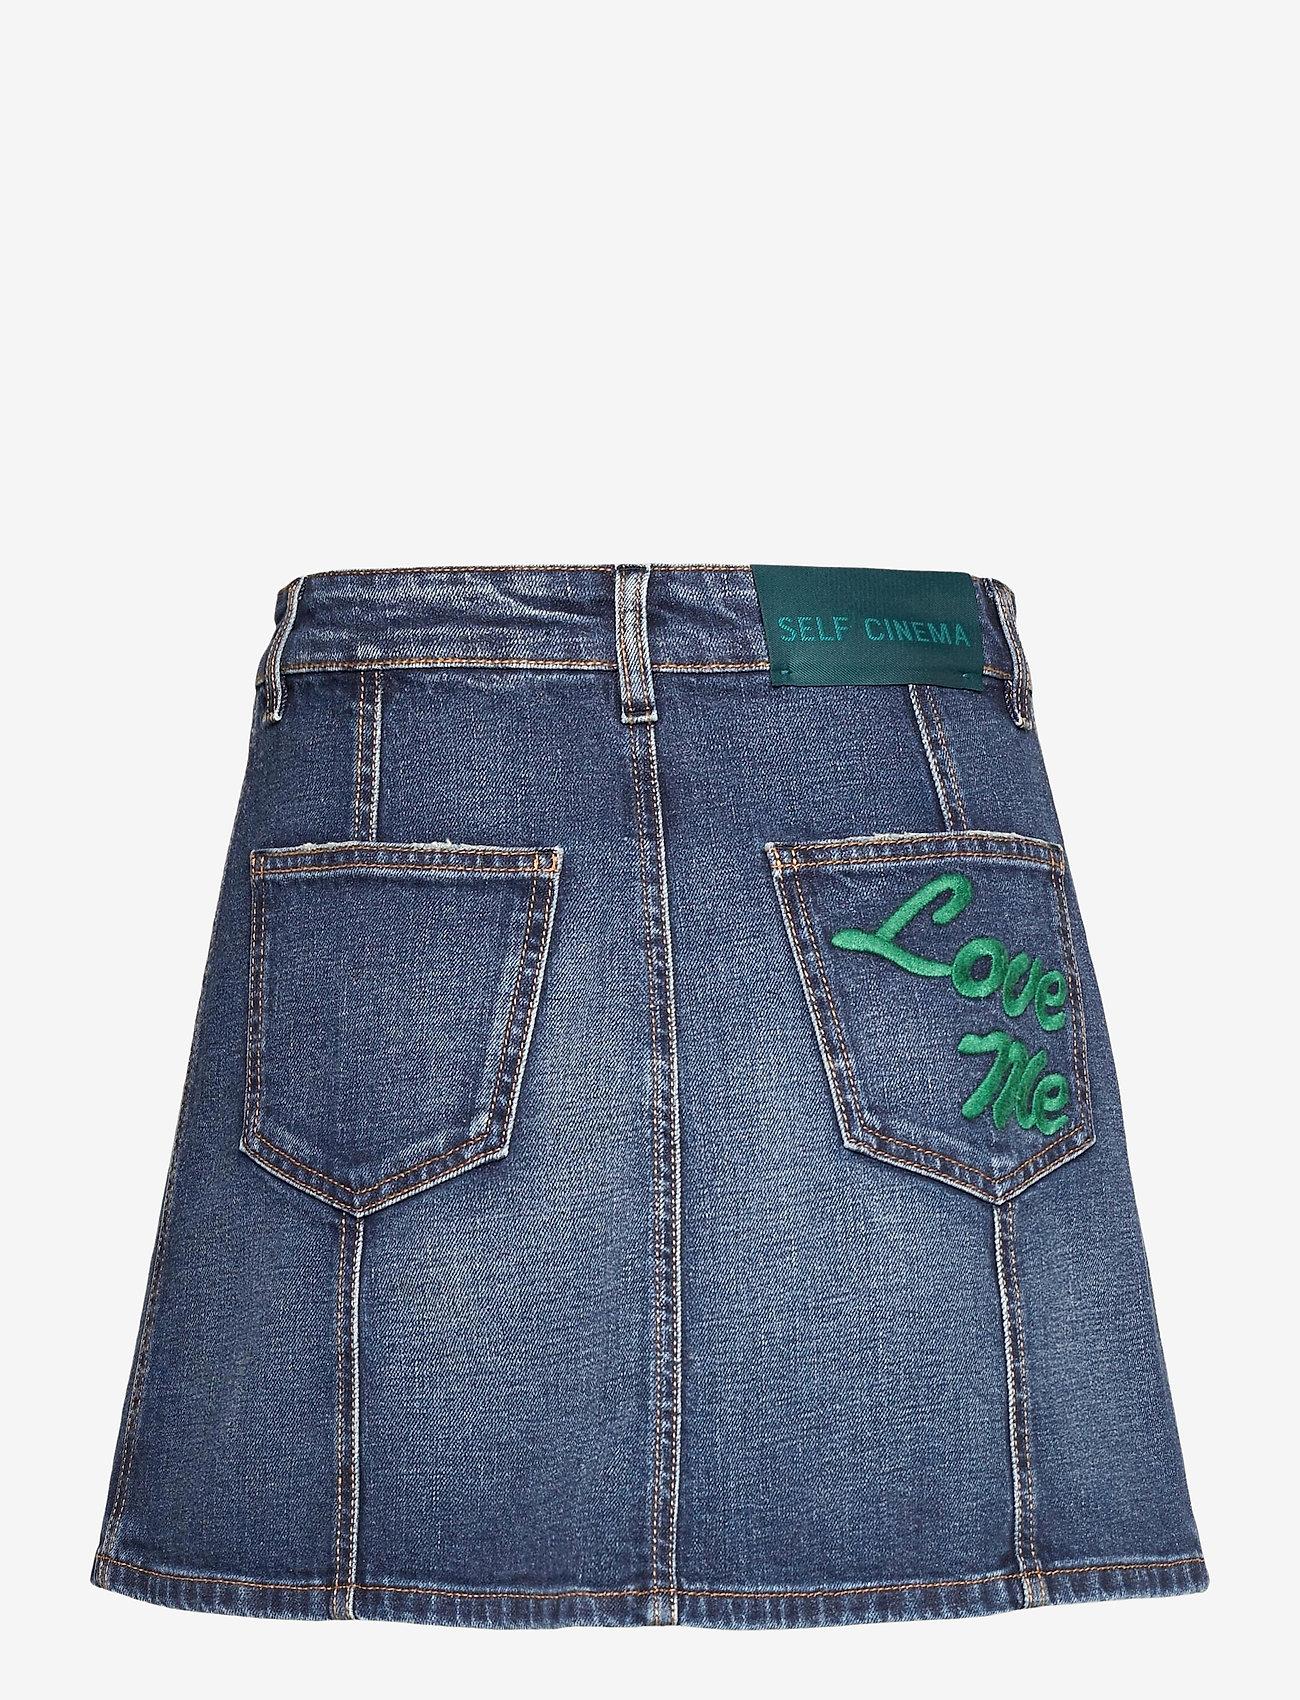 Self Cinema - Womens Denim Skirt Embroidered - jeanskjolar - mid blue vintage - 1